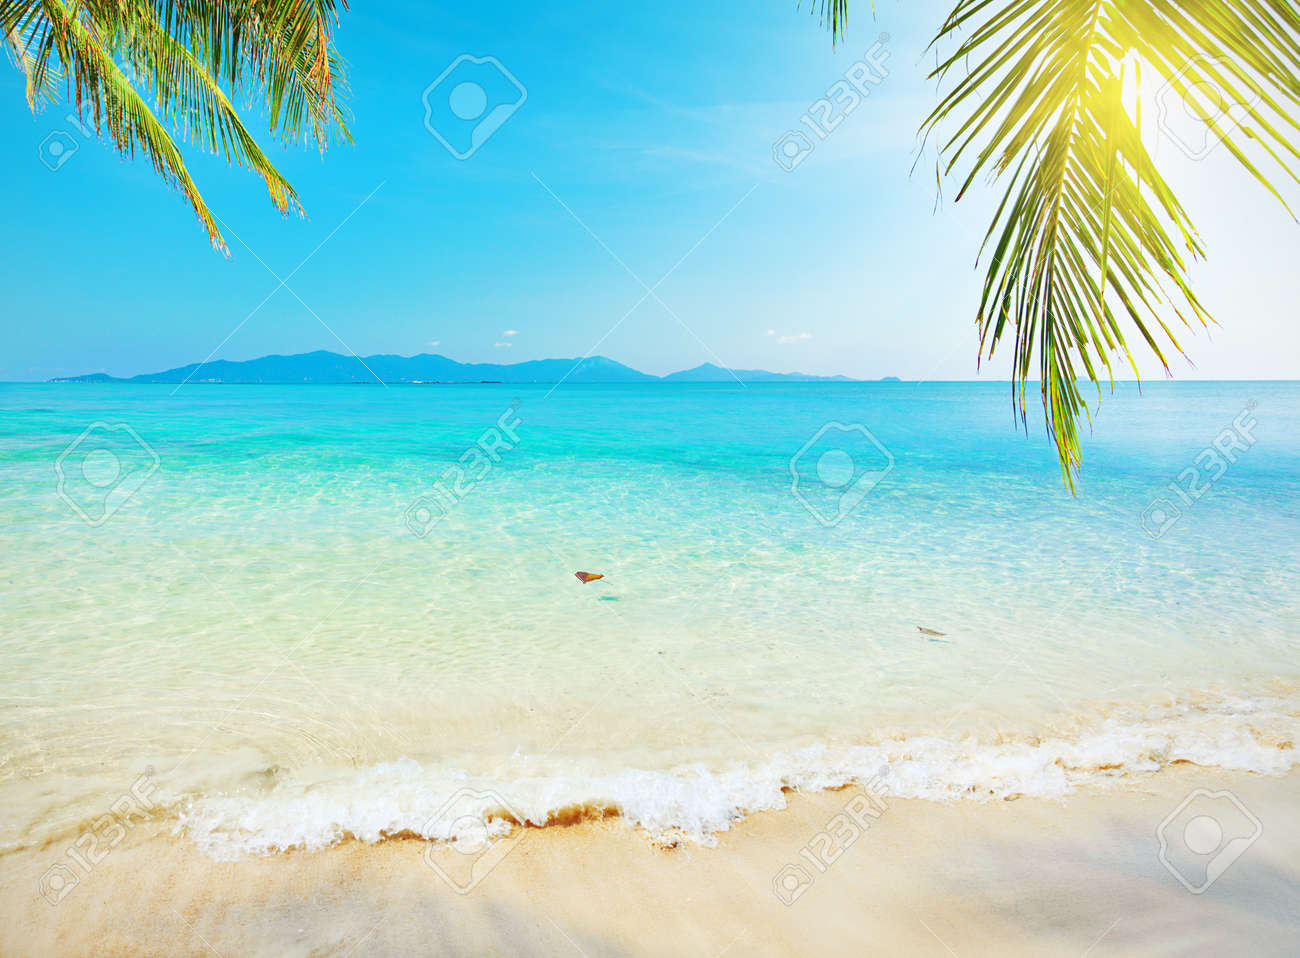 Palm leaf and tropical beach - 12007605